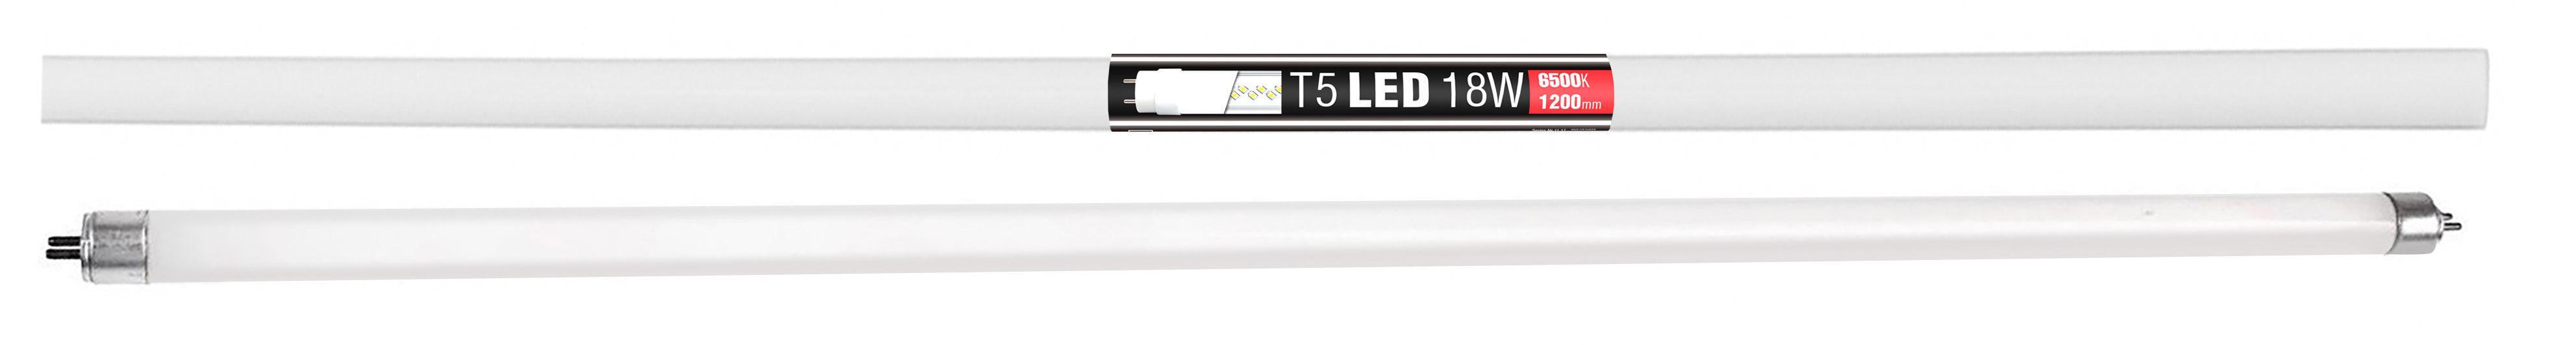 Лампа светодиодная Rev ritter T5 1149мм (32442 3)